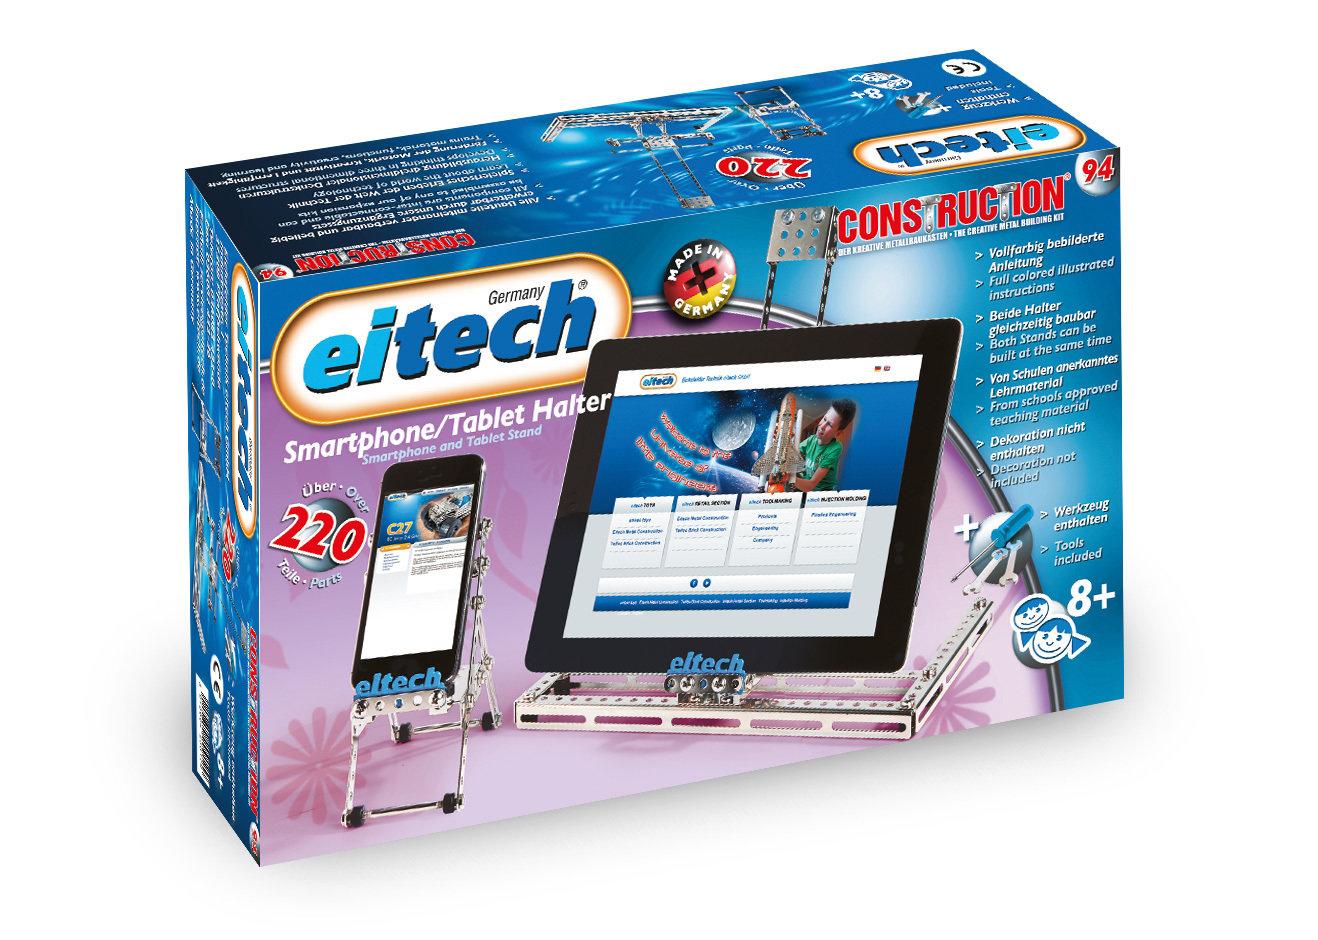 Eitech 00094 Soporte para Smartphone / Tablet